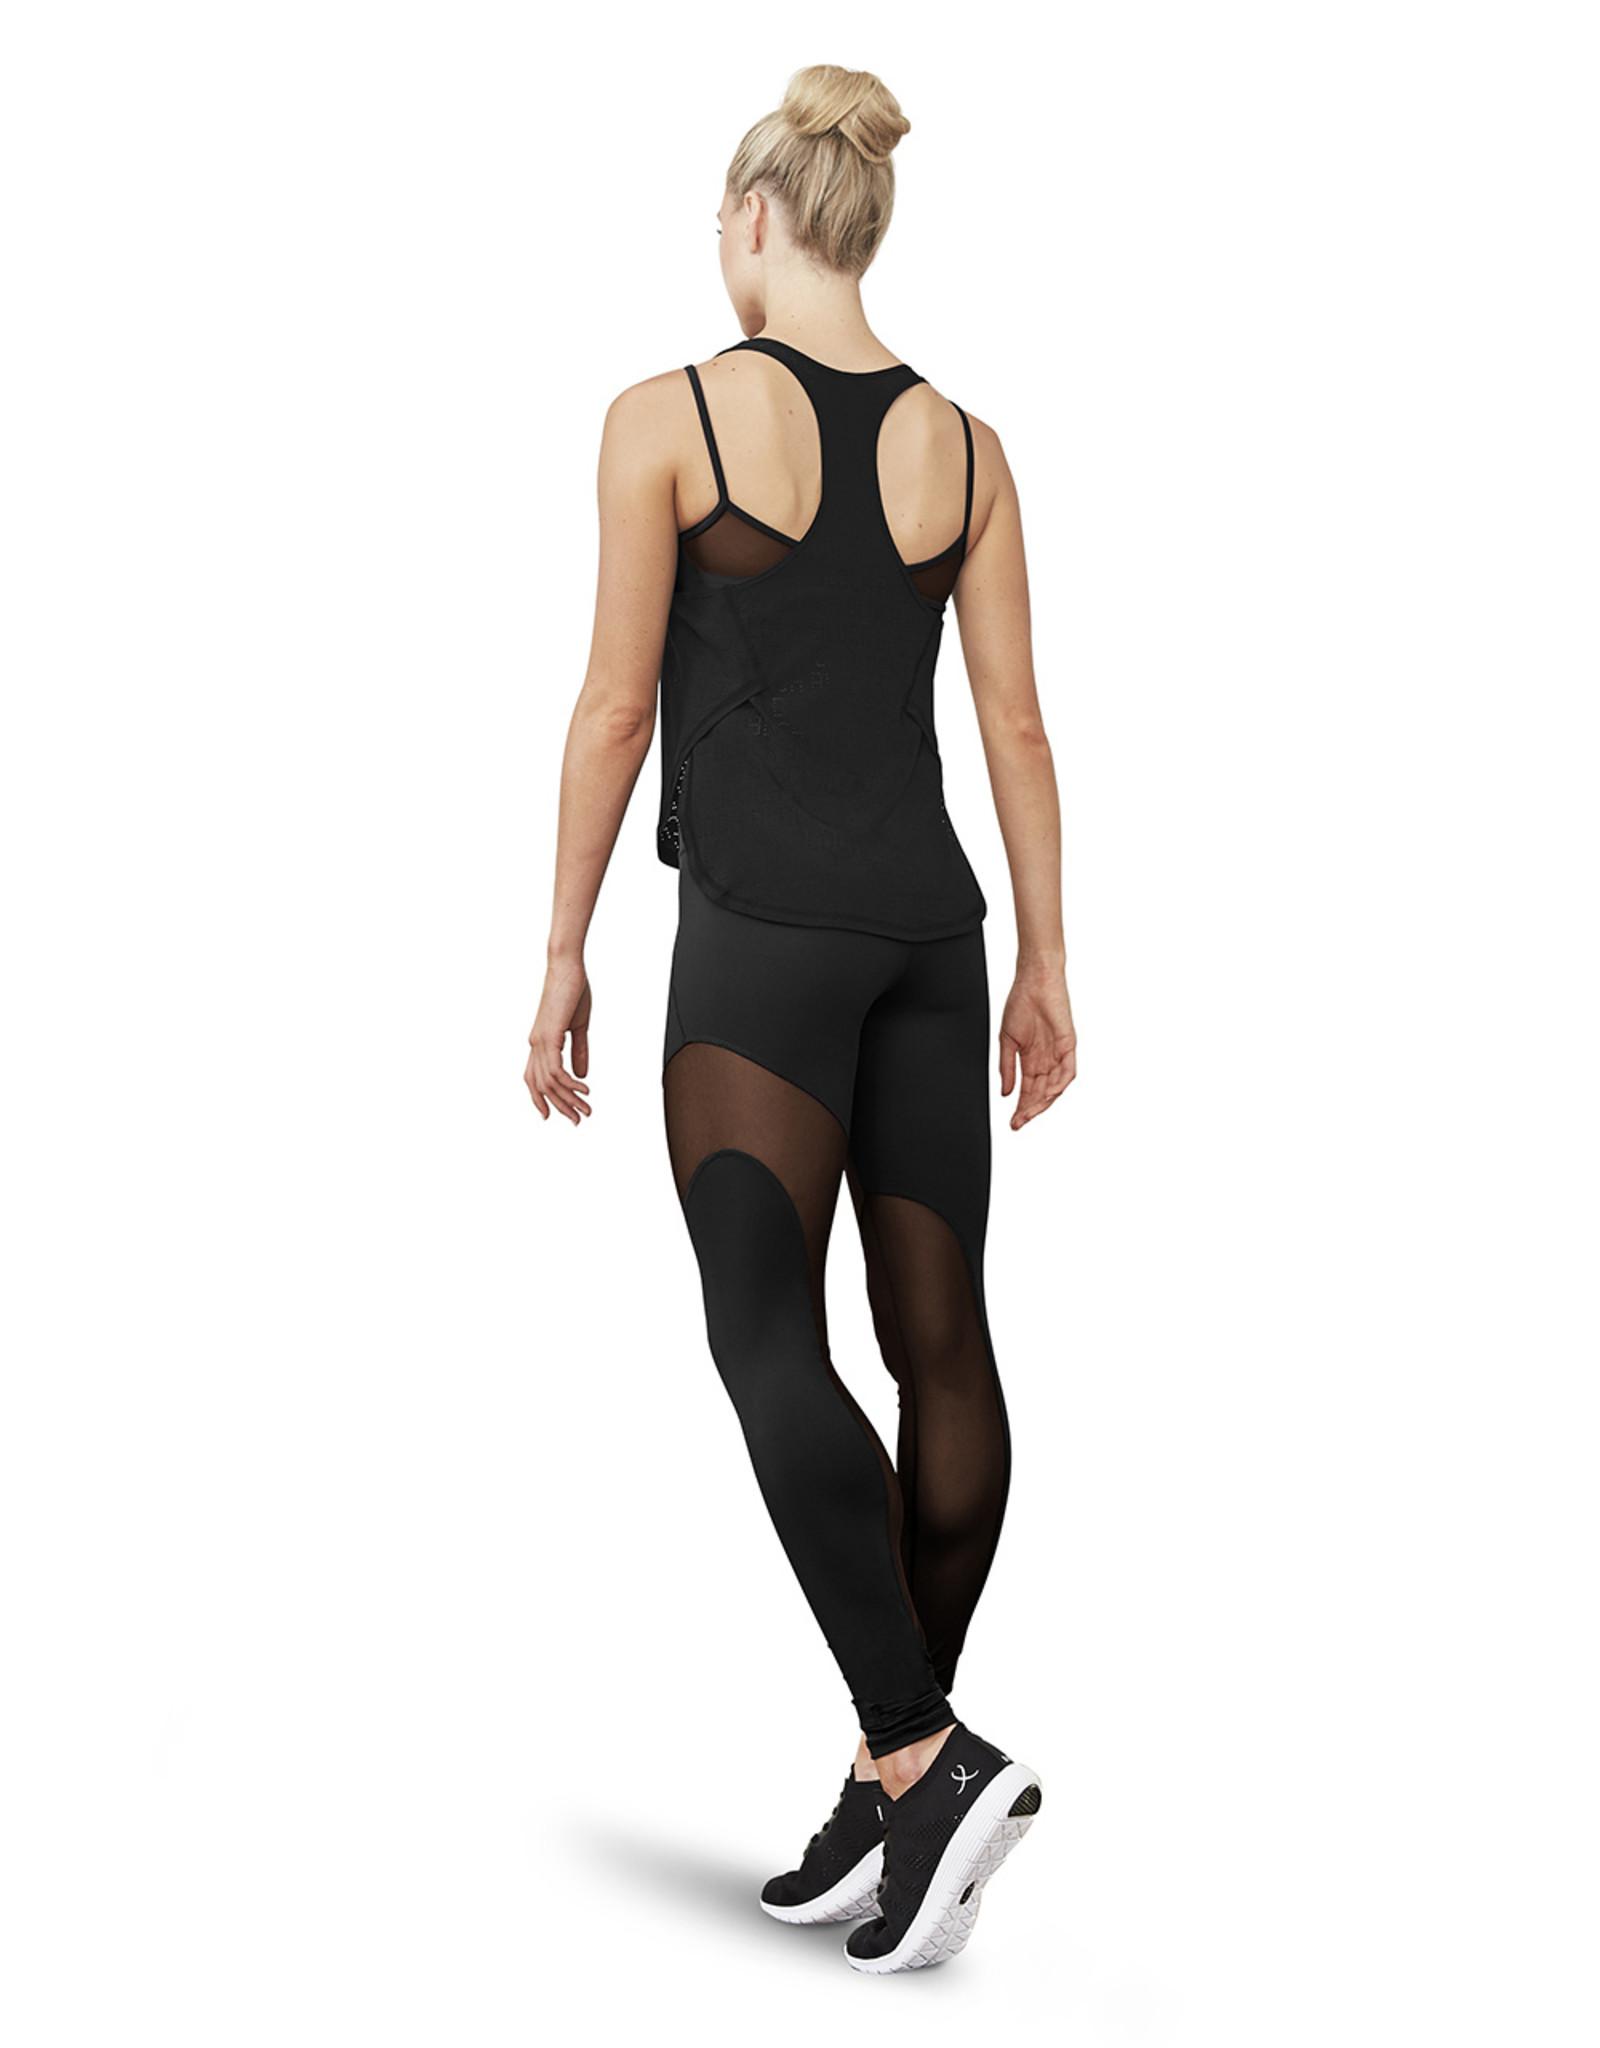 Bloch / Mirella Mesh panel legging (FP5146)